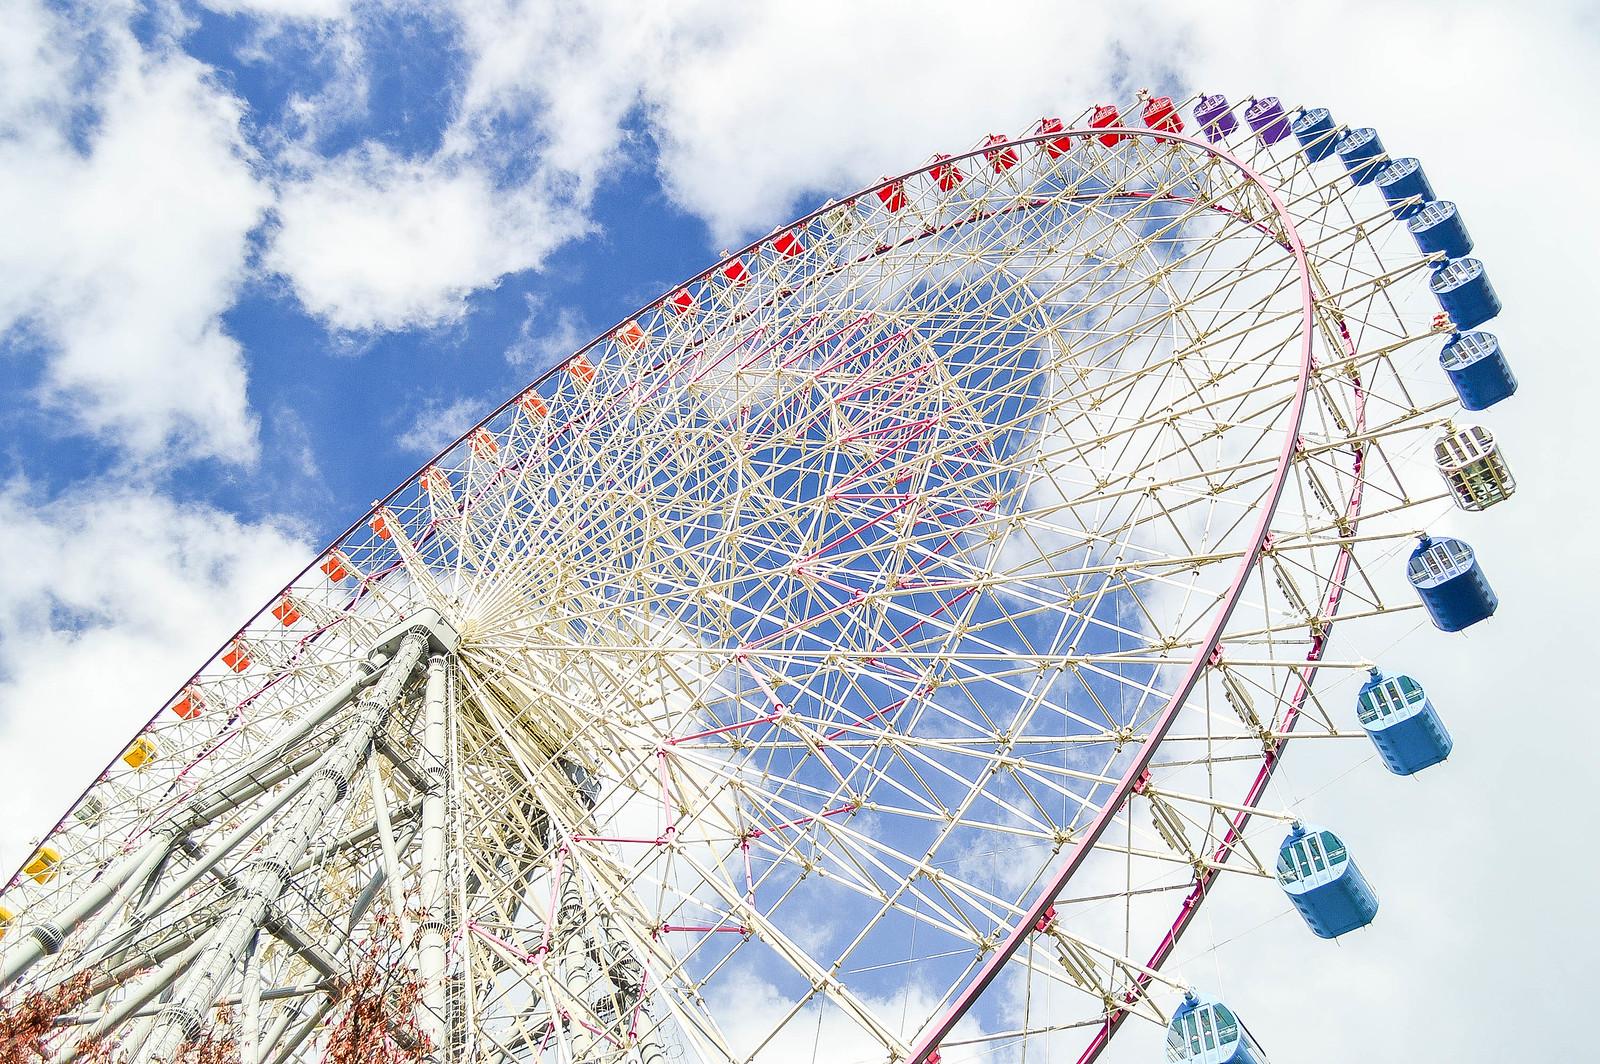 Osaka Tempozan Ferris Wheel